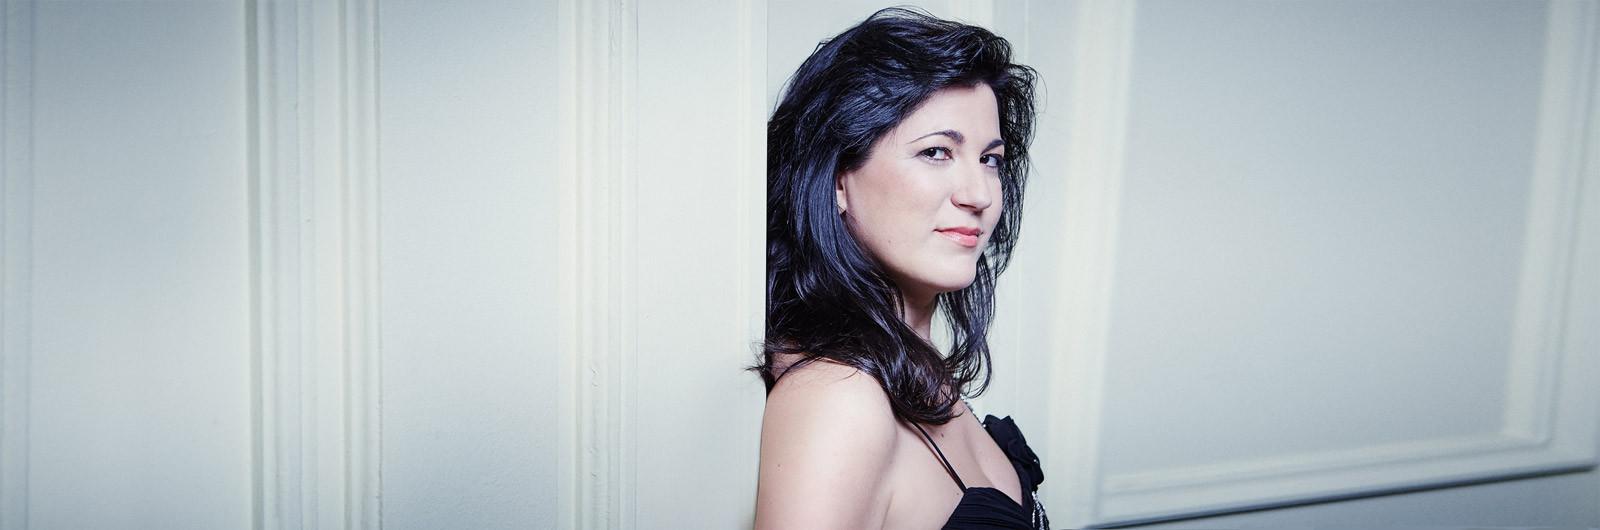 Cristina Faus foto portada 1